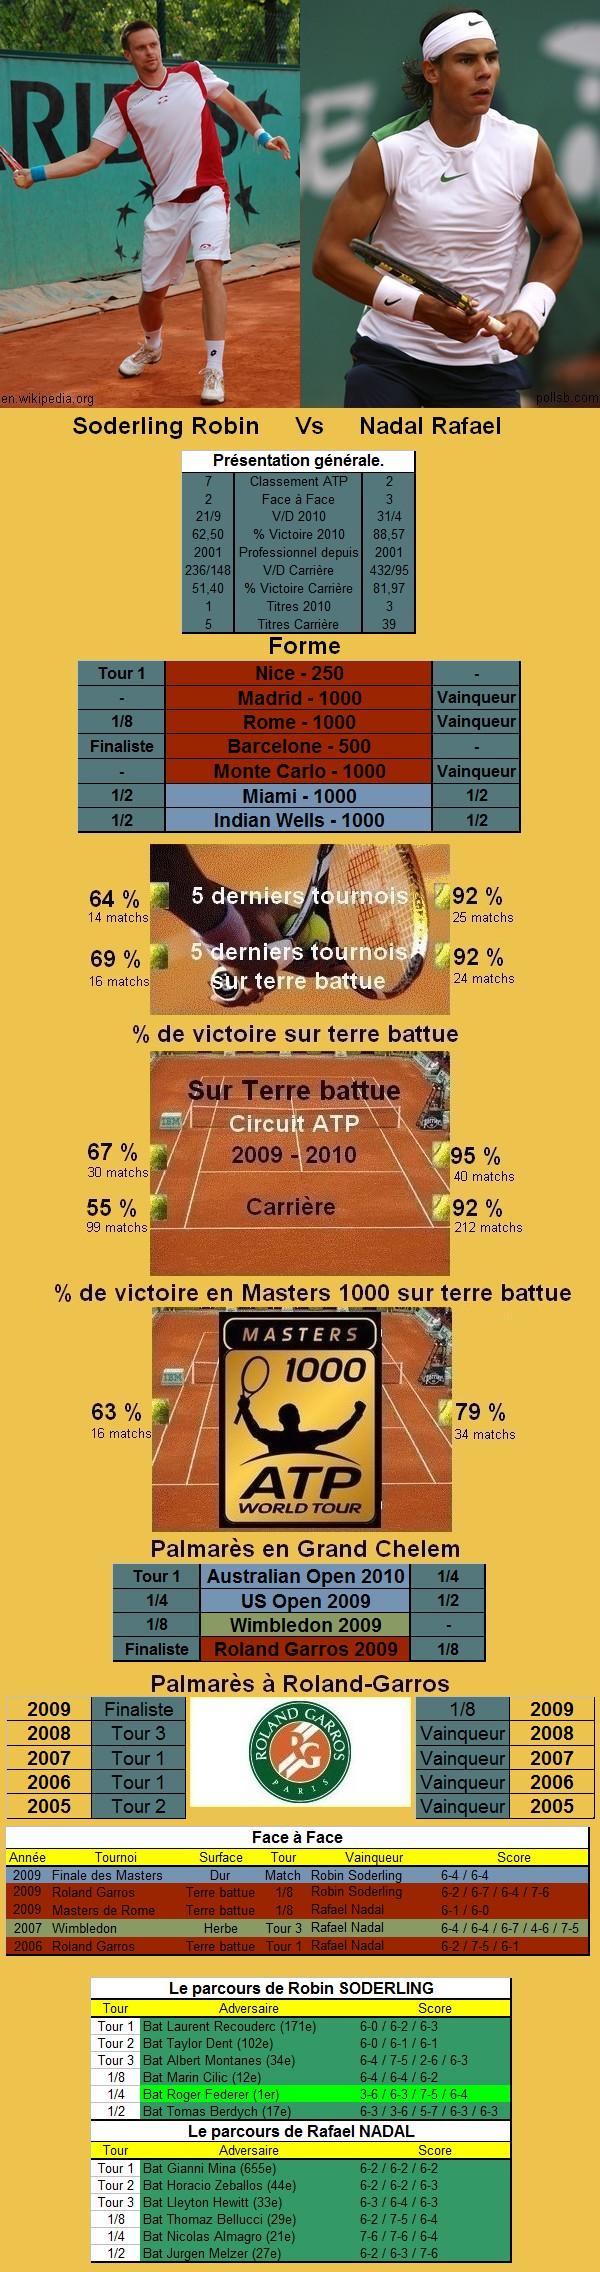 Statistiques tennis de Soderling contre Nadal à Roland Garros